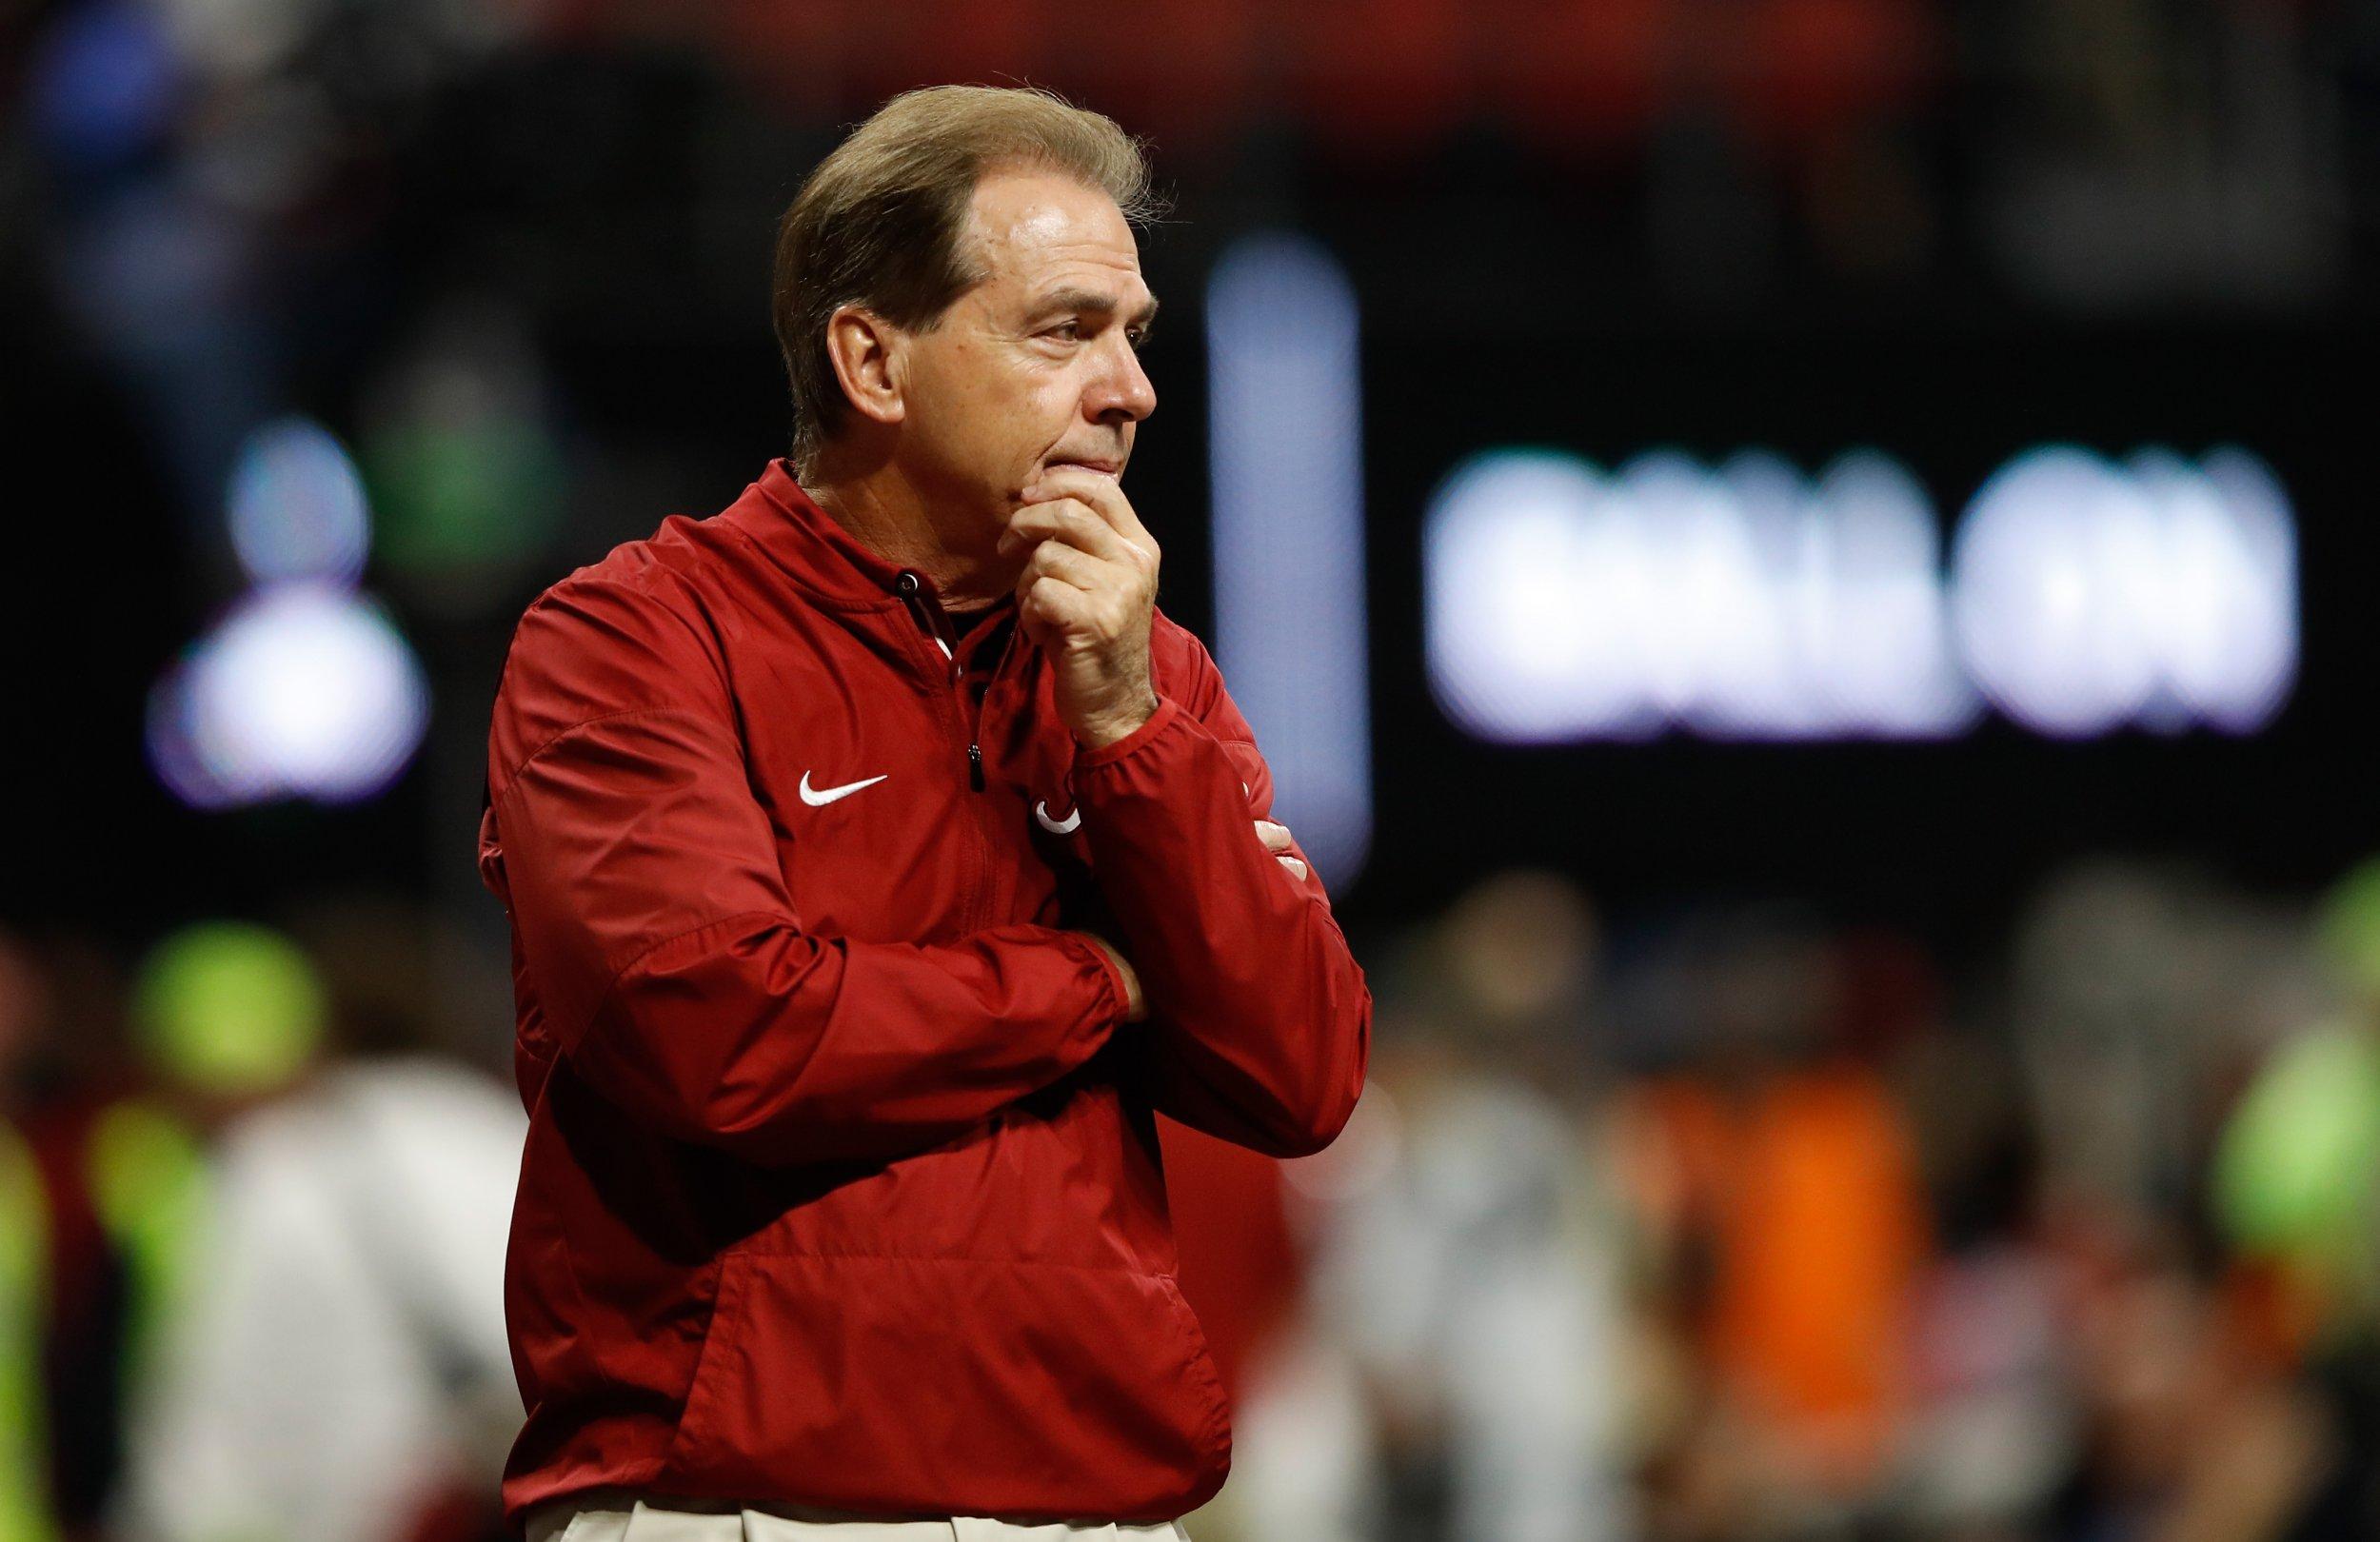 Wonderful Is Nick Saban The Greatest College Coach Of All Time? Alabama Wins Thriller  Over Georgia, Boosting Coachu0027s Resume  Nick Saban Resume